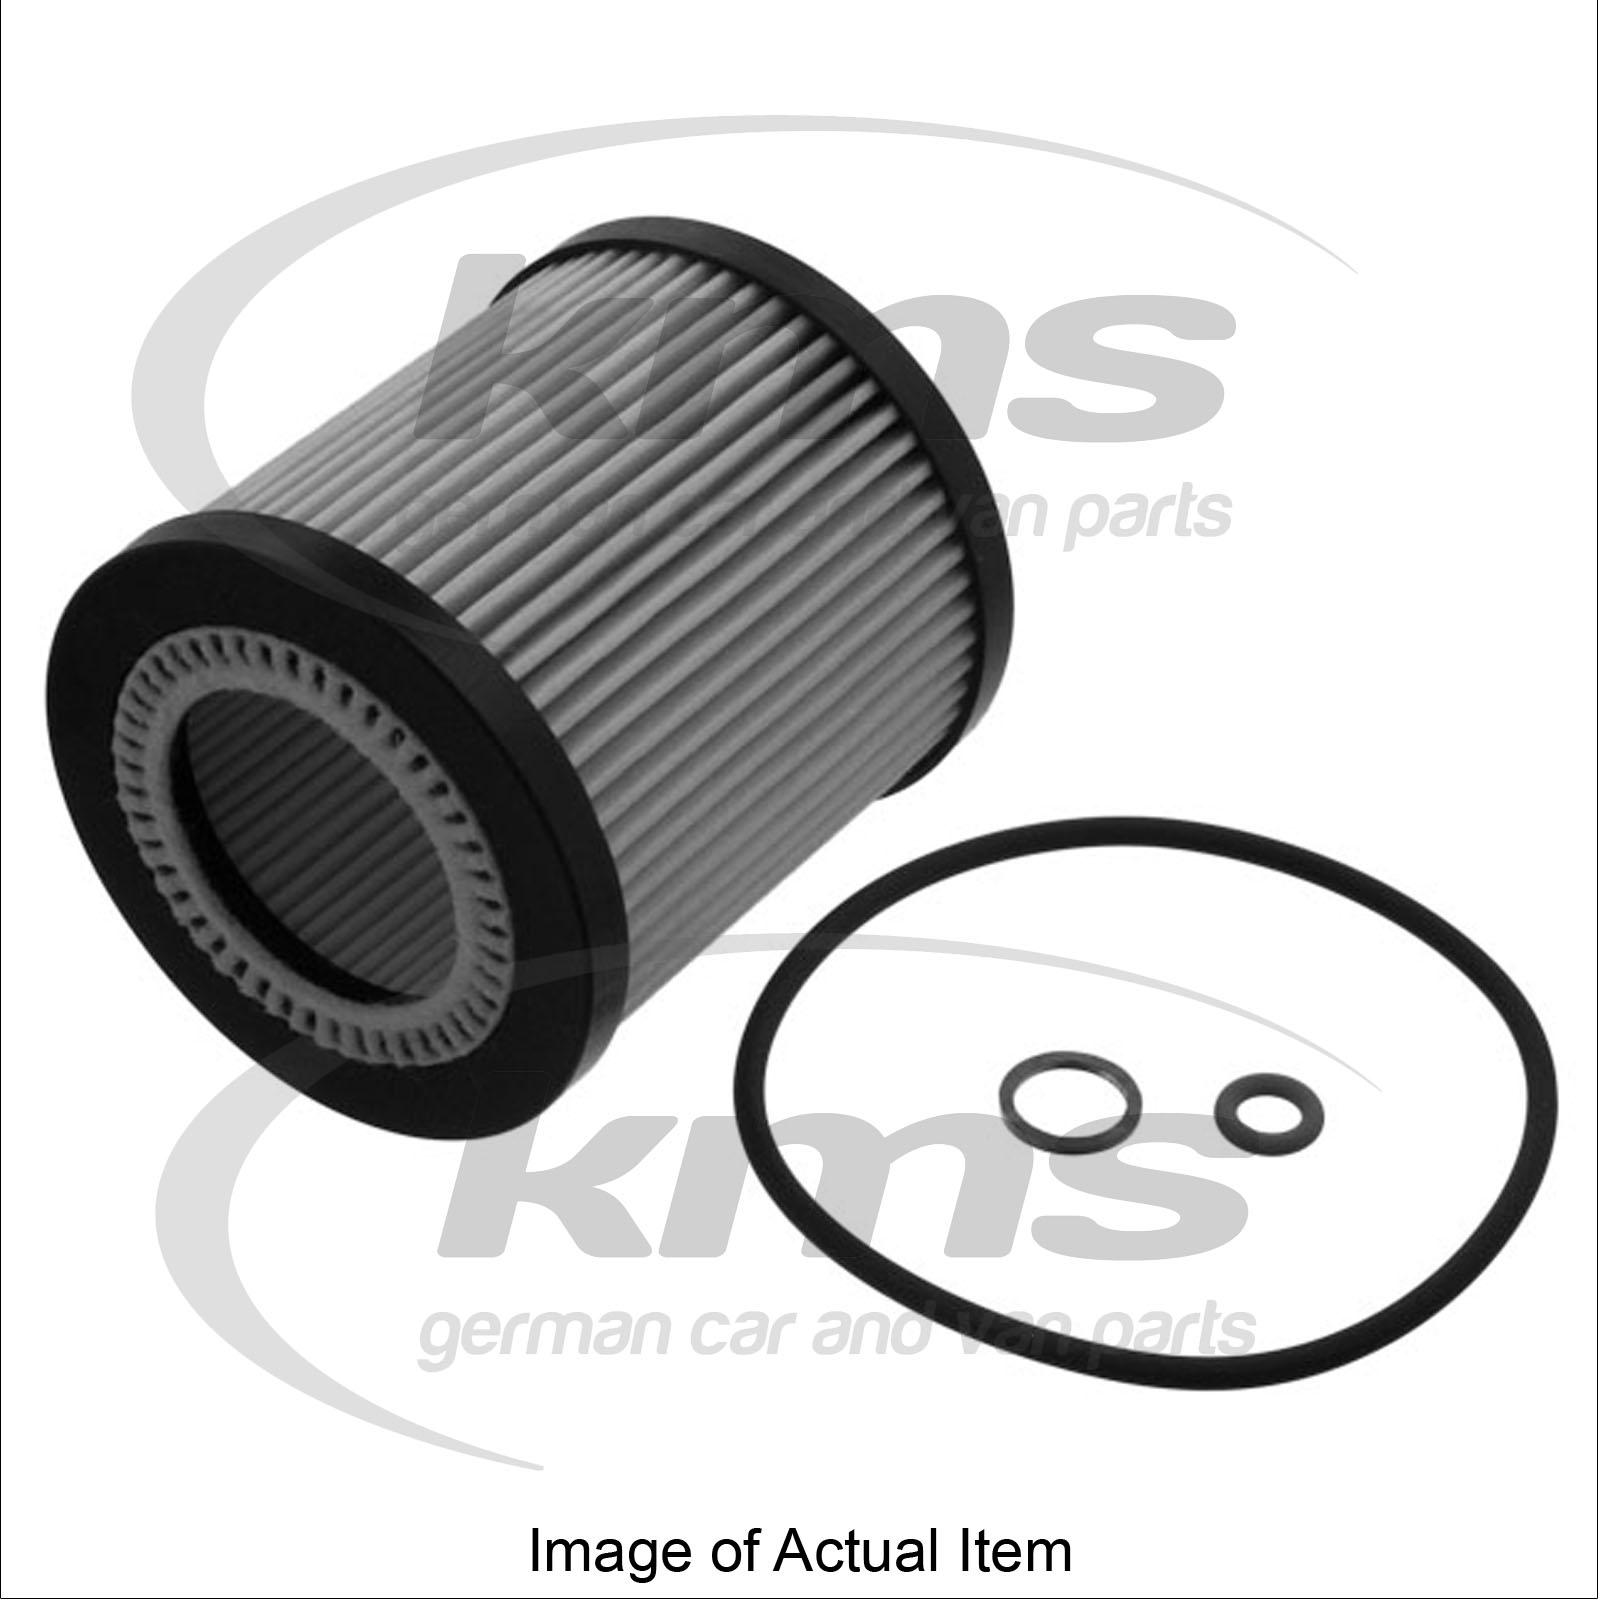 Bmw Z4 Check Engine Light: OIL FILTER BMW Z4 Convertible SDrive23i E89 2.5L